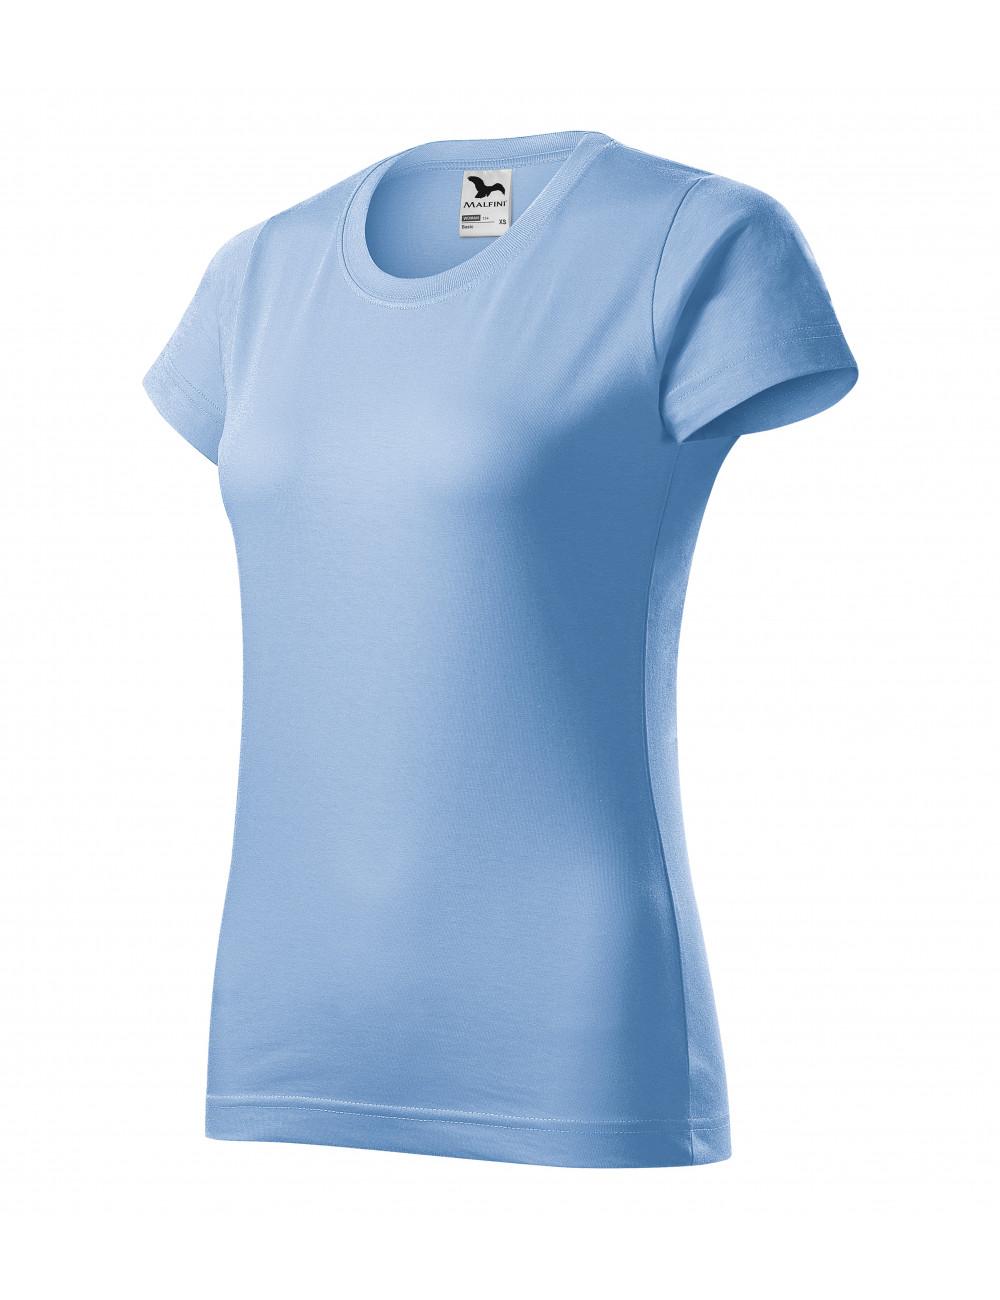 Adler MALFINI Koszulka damska Basic 134 błękitny